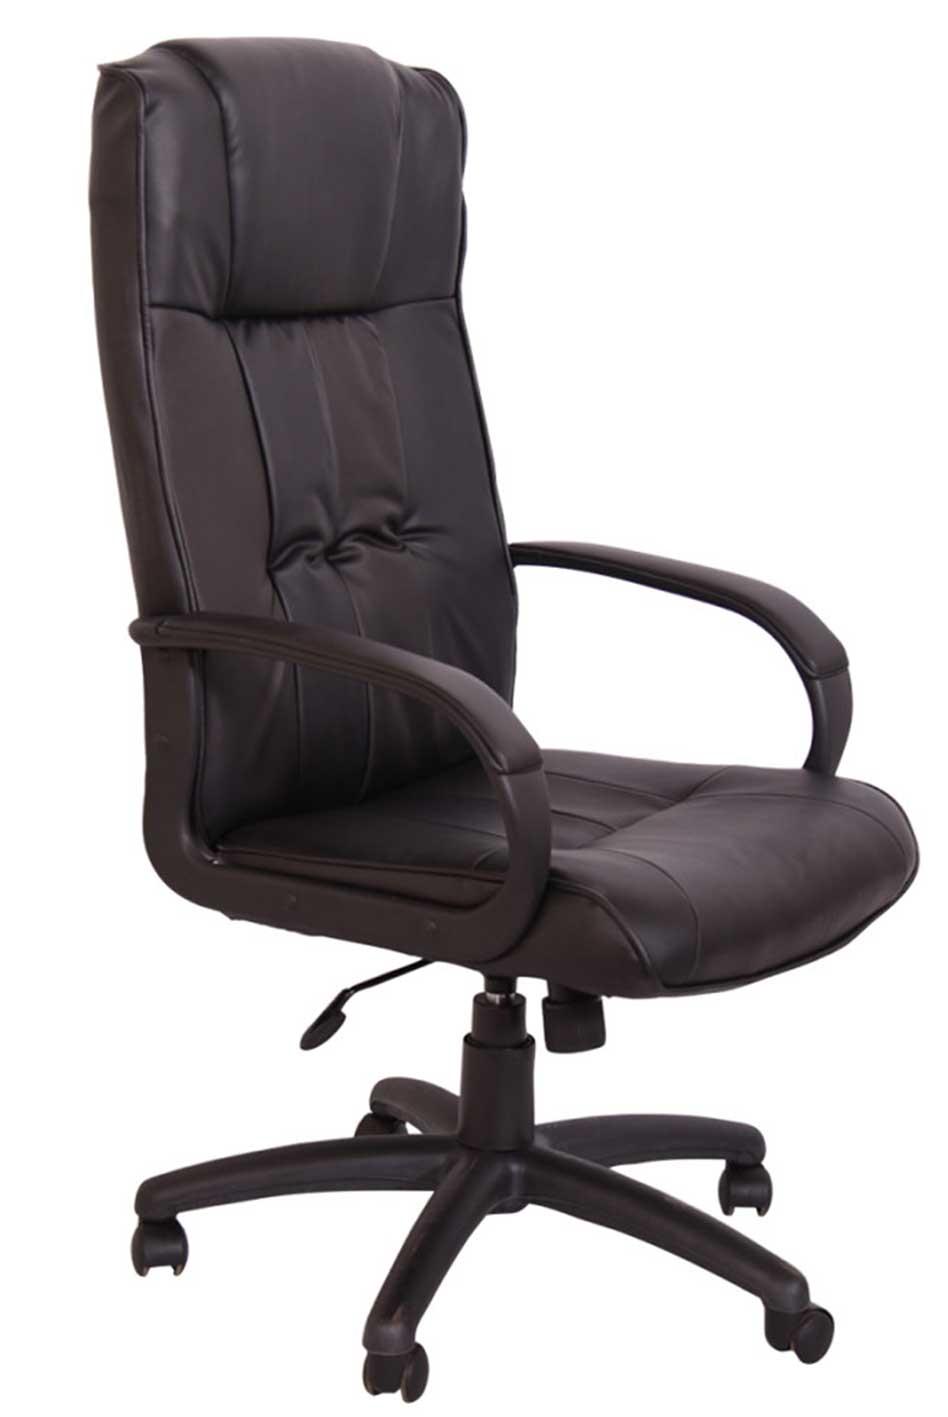 Dea013 Office Executive Chair Office Chair For Sale